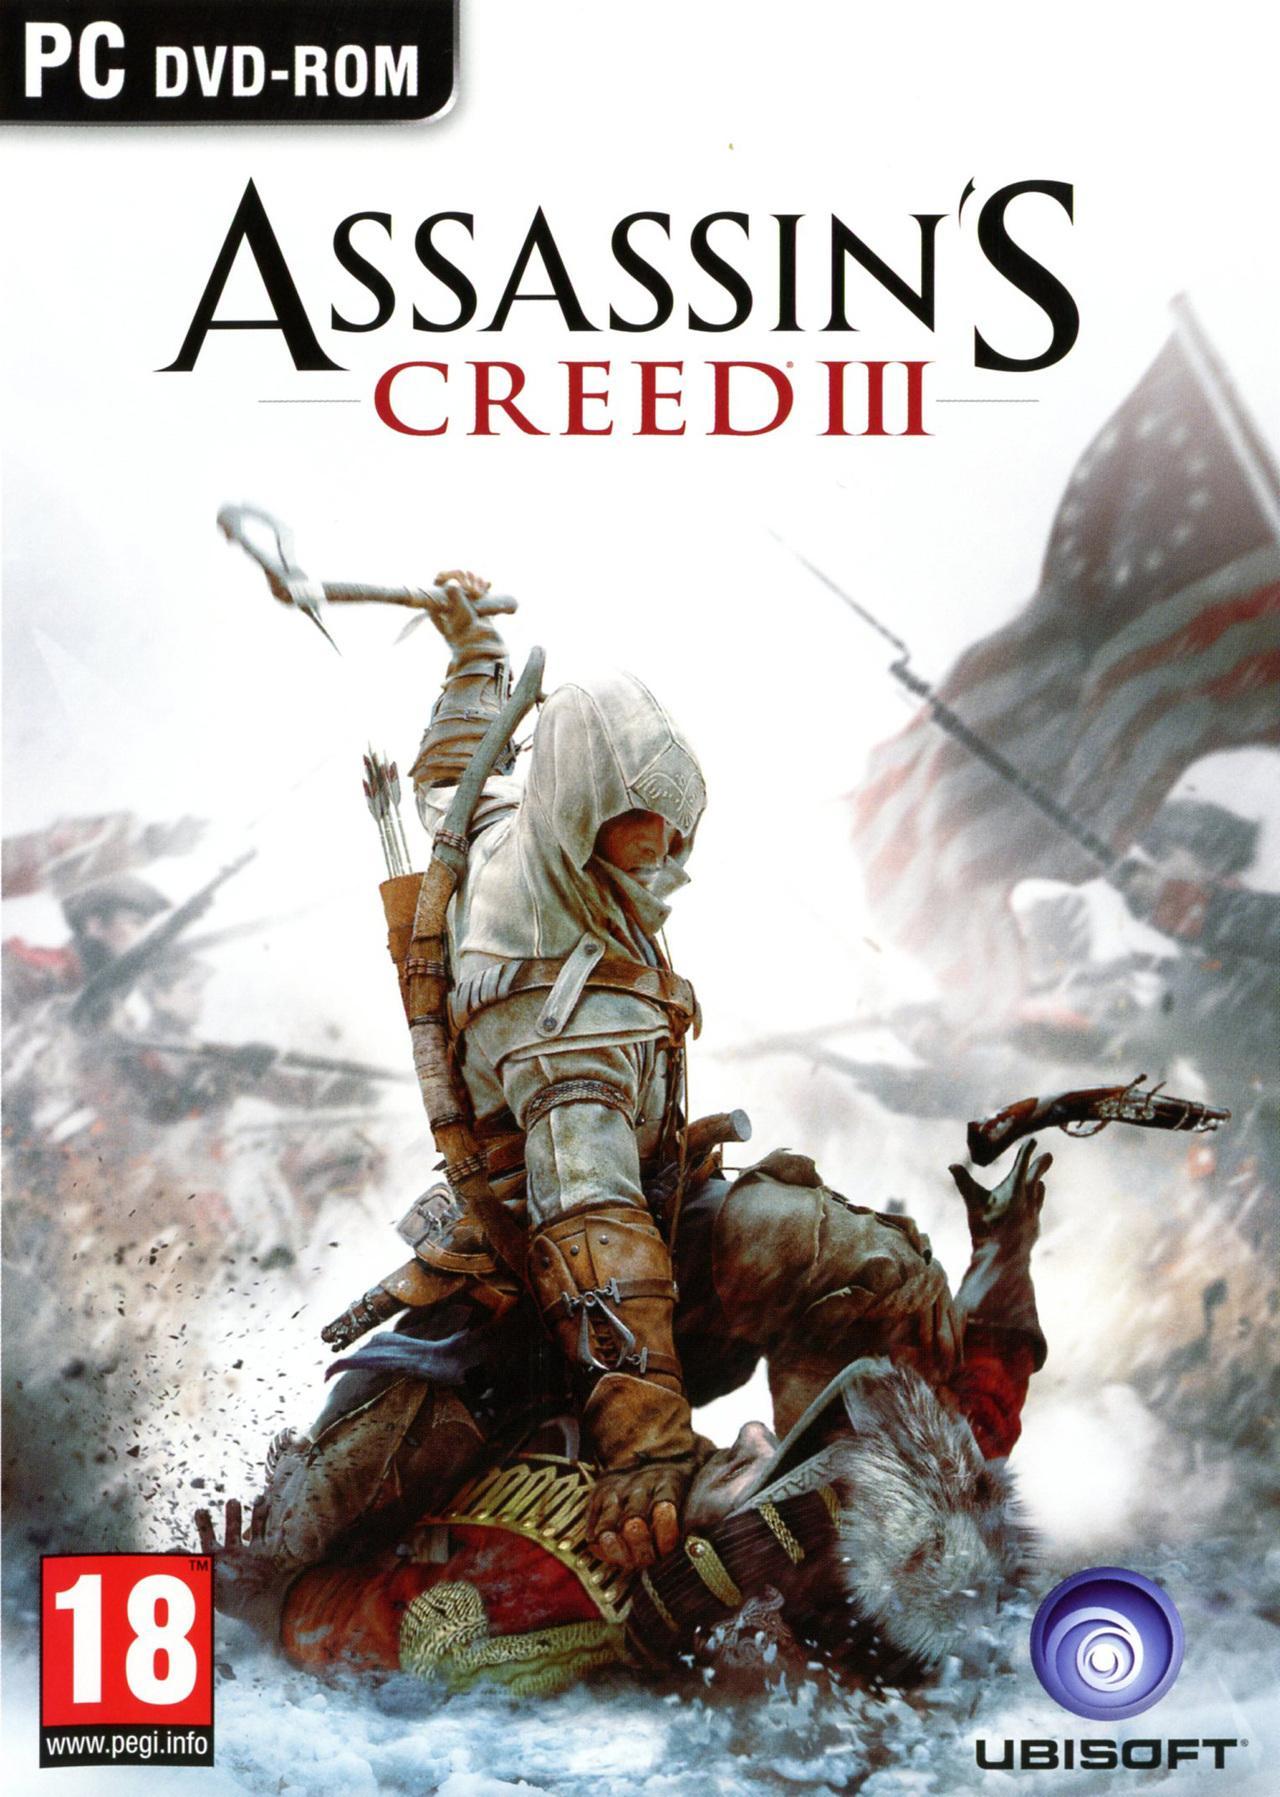 Assassin's Creed III - Édition Deluxe (jeu + season pass) sur PC (dématérialisé, Uplay)